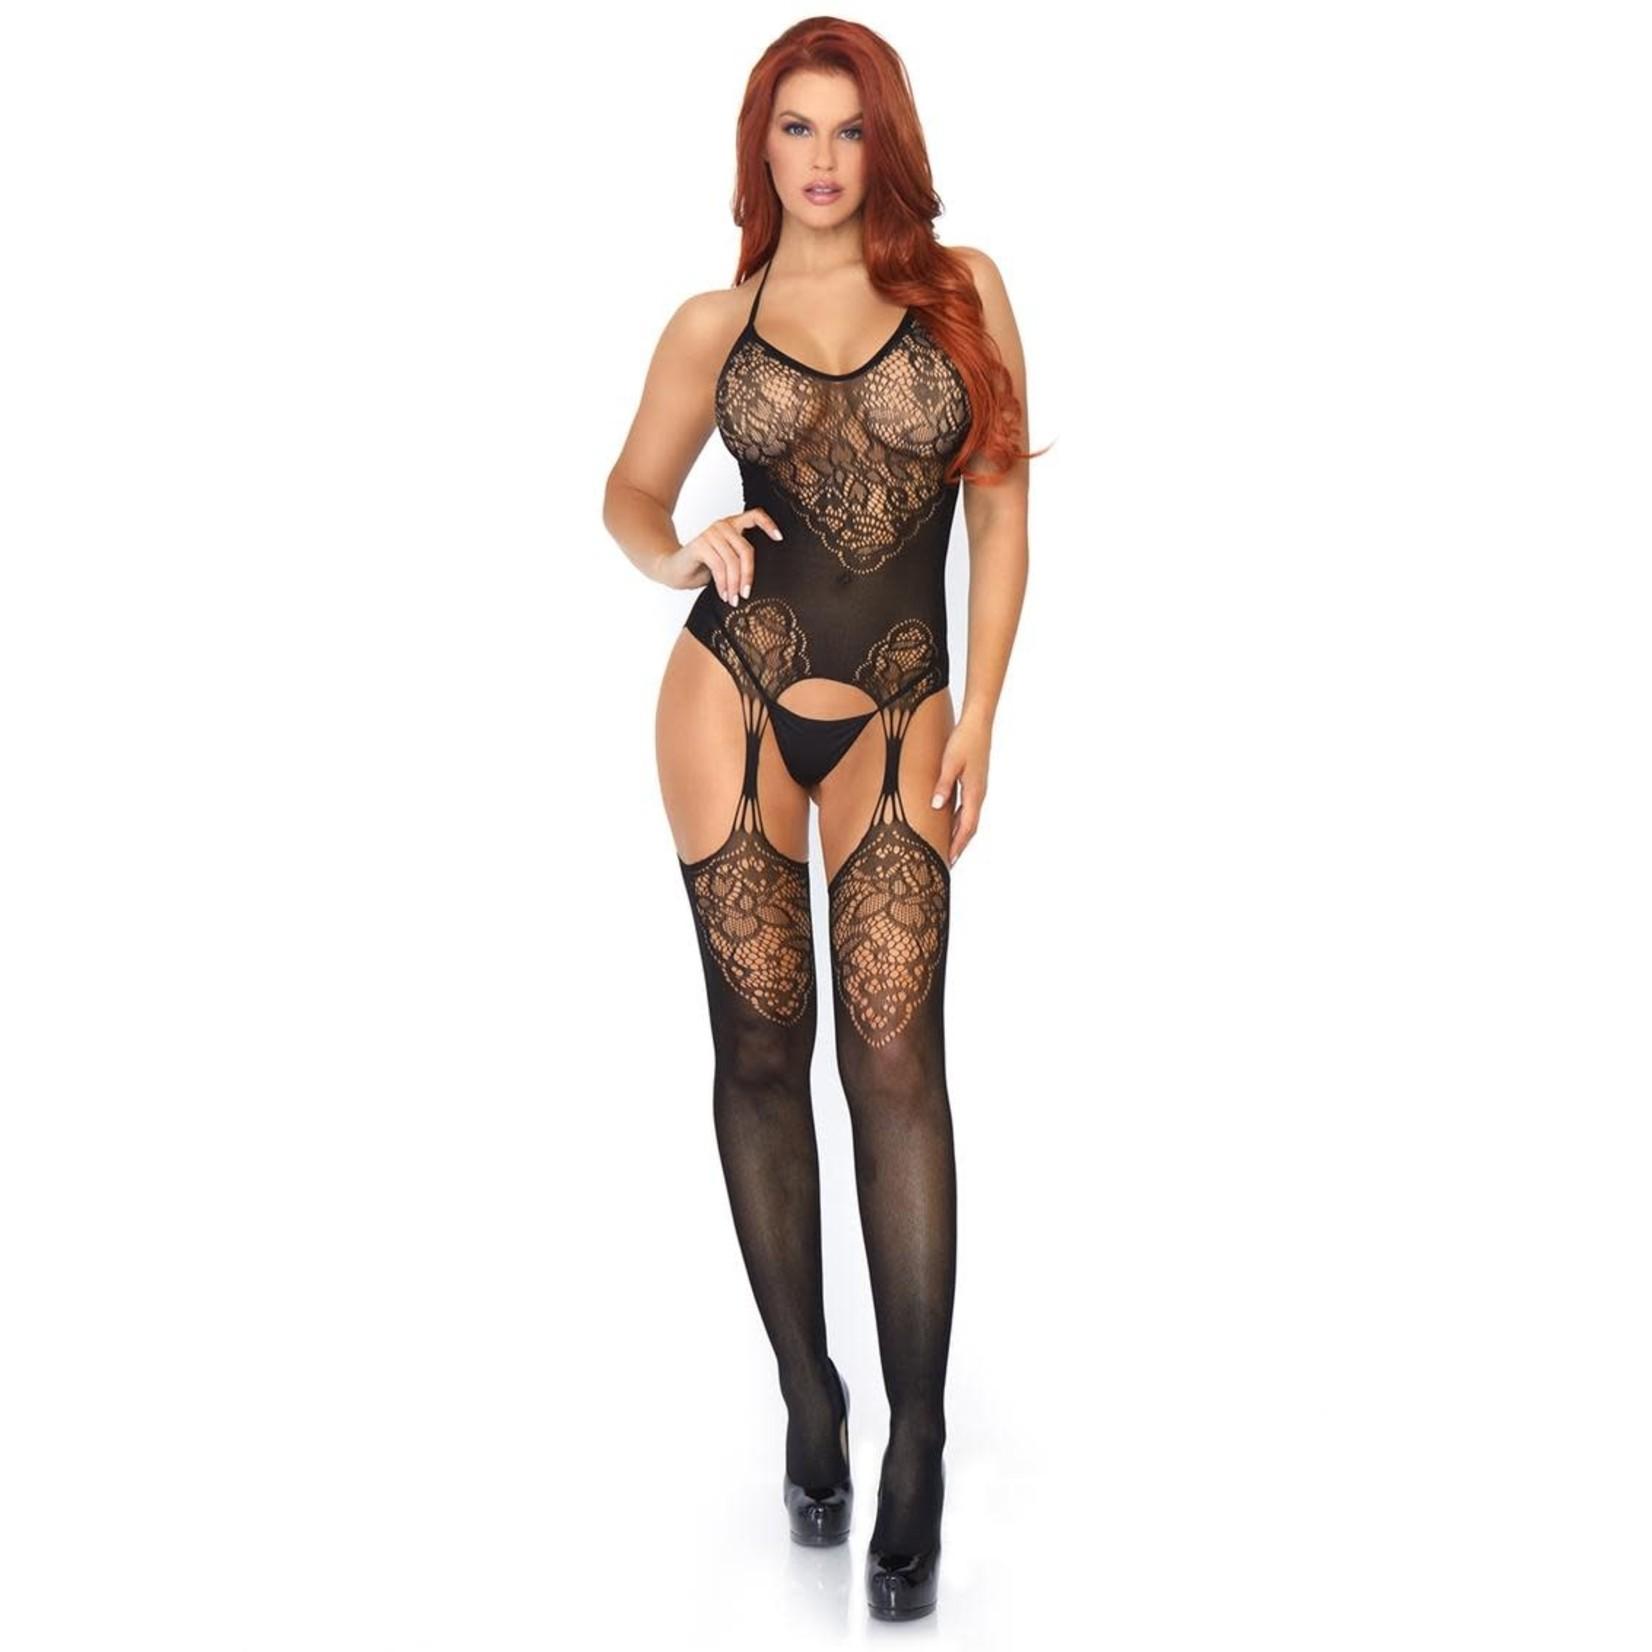 Leg Avenue Seamless Lace Jacquard Net Suspender Bodystocking - O/S - Black